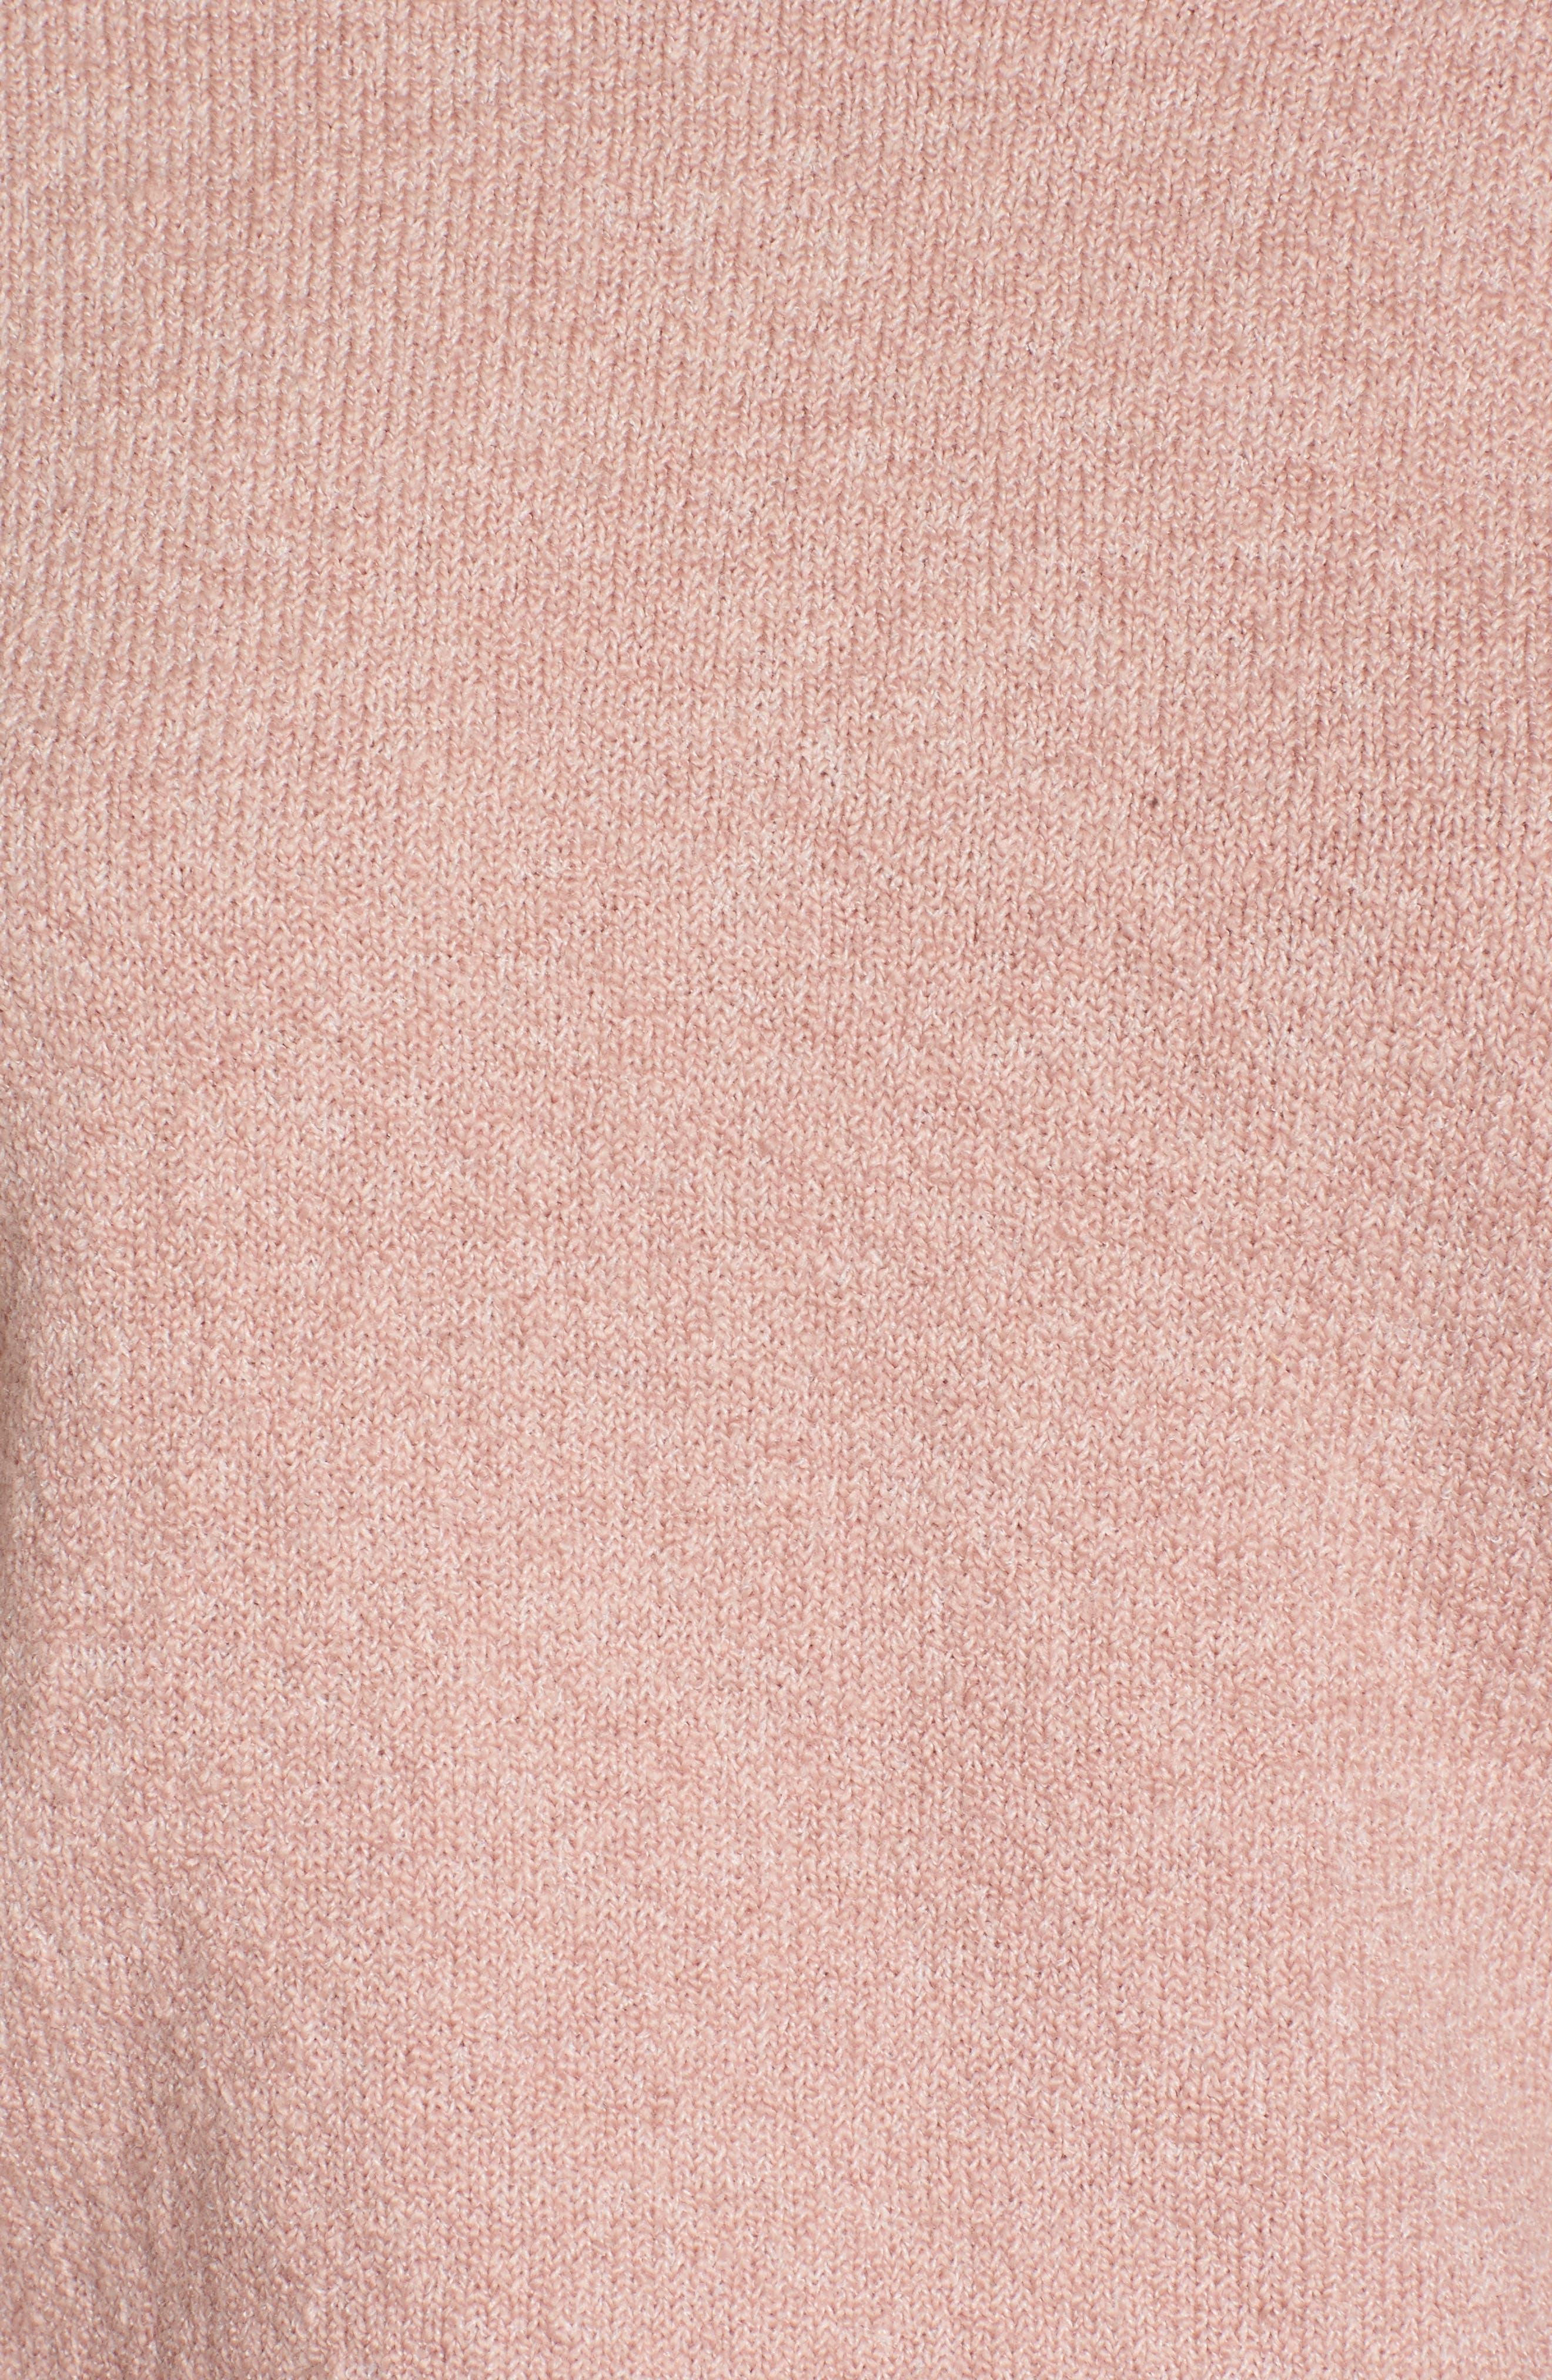 Dolman Sleeve Sweater,                             Alternate thumbnail 20, color,